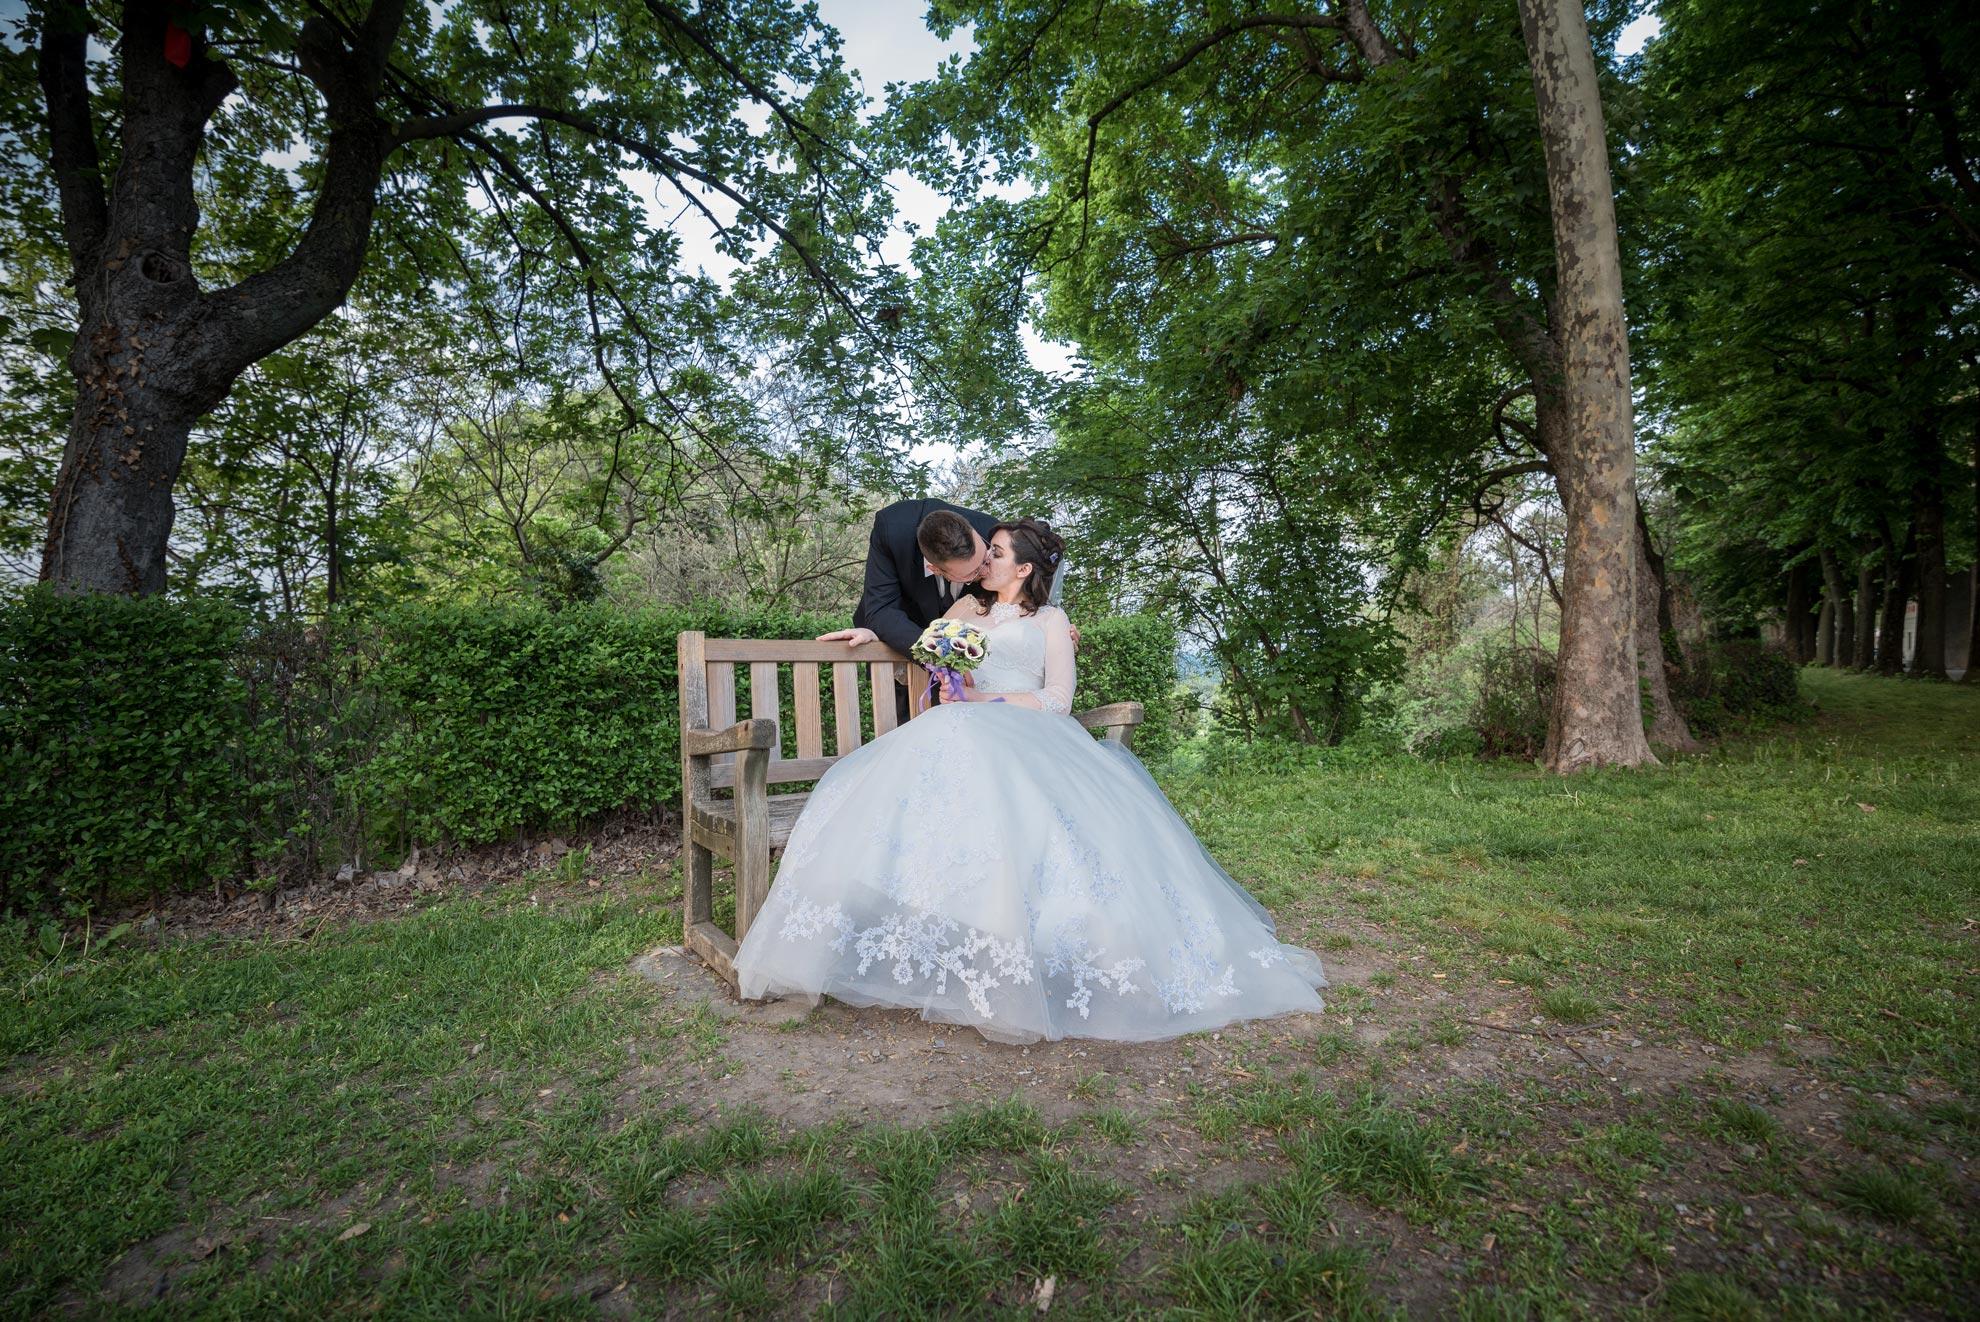 Matrimonio a Narzole Lorenza Diego - DSC 0734 - Fotografo Matrimonio a Cherasco - Fotografo Matrimonio a Cherasco